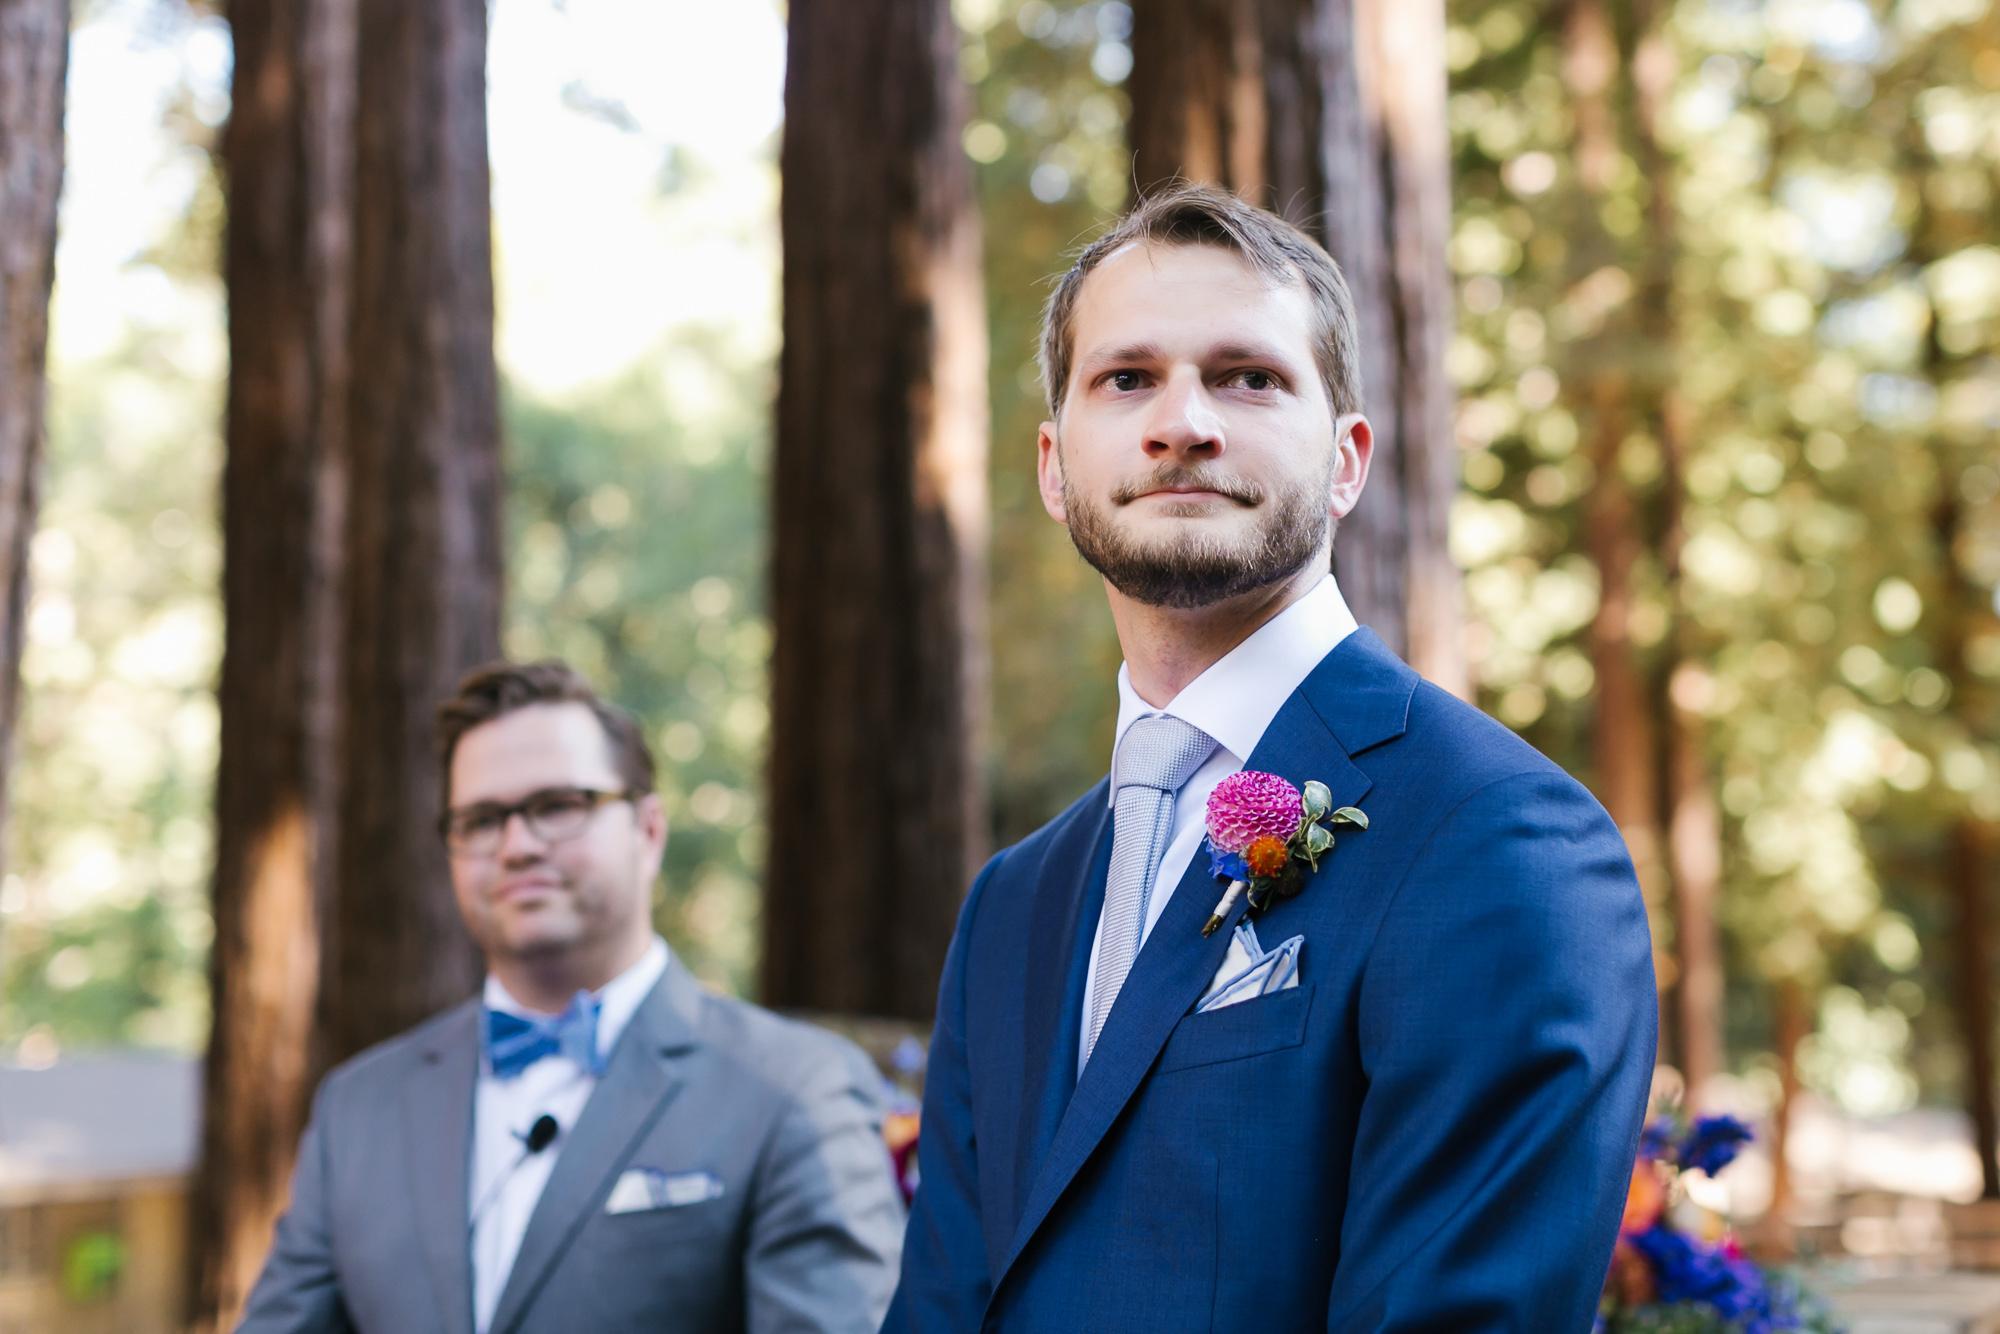 Groom in blue suit gets emotional watching his bride walk down the aisle